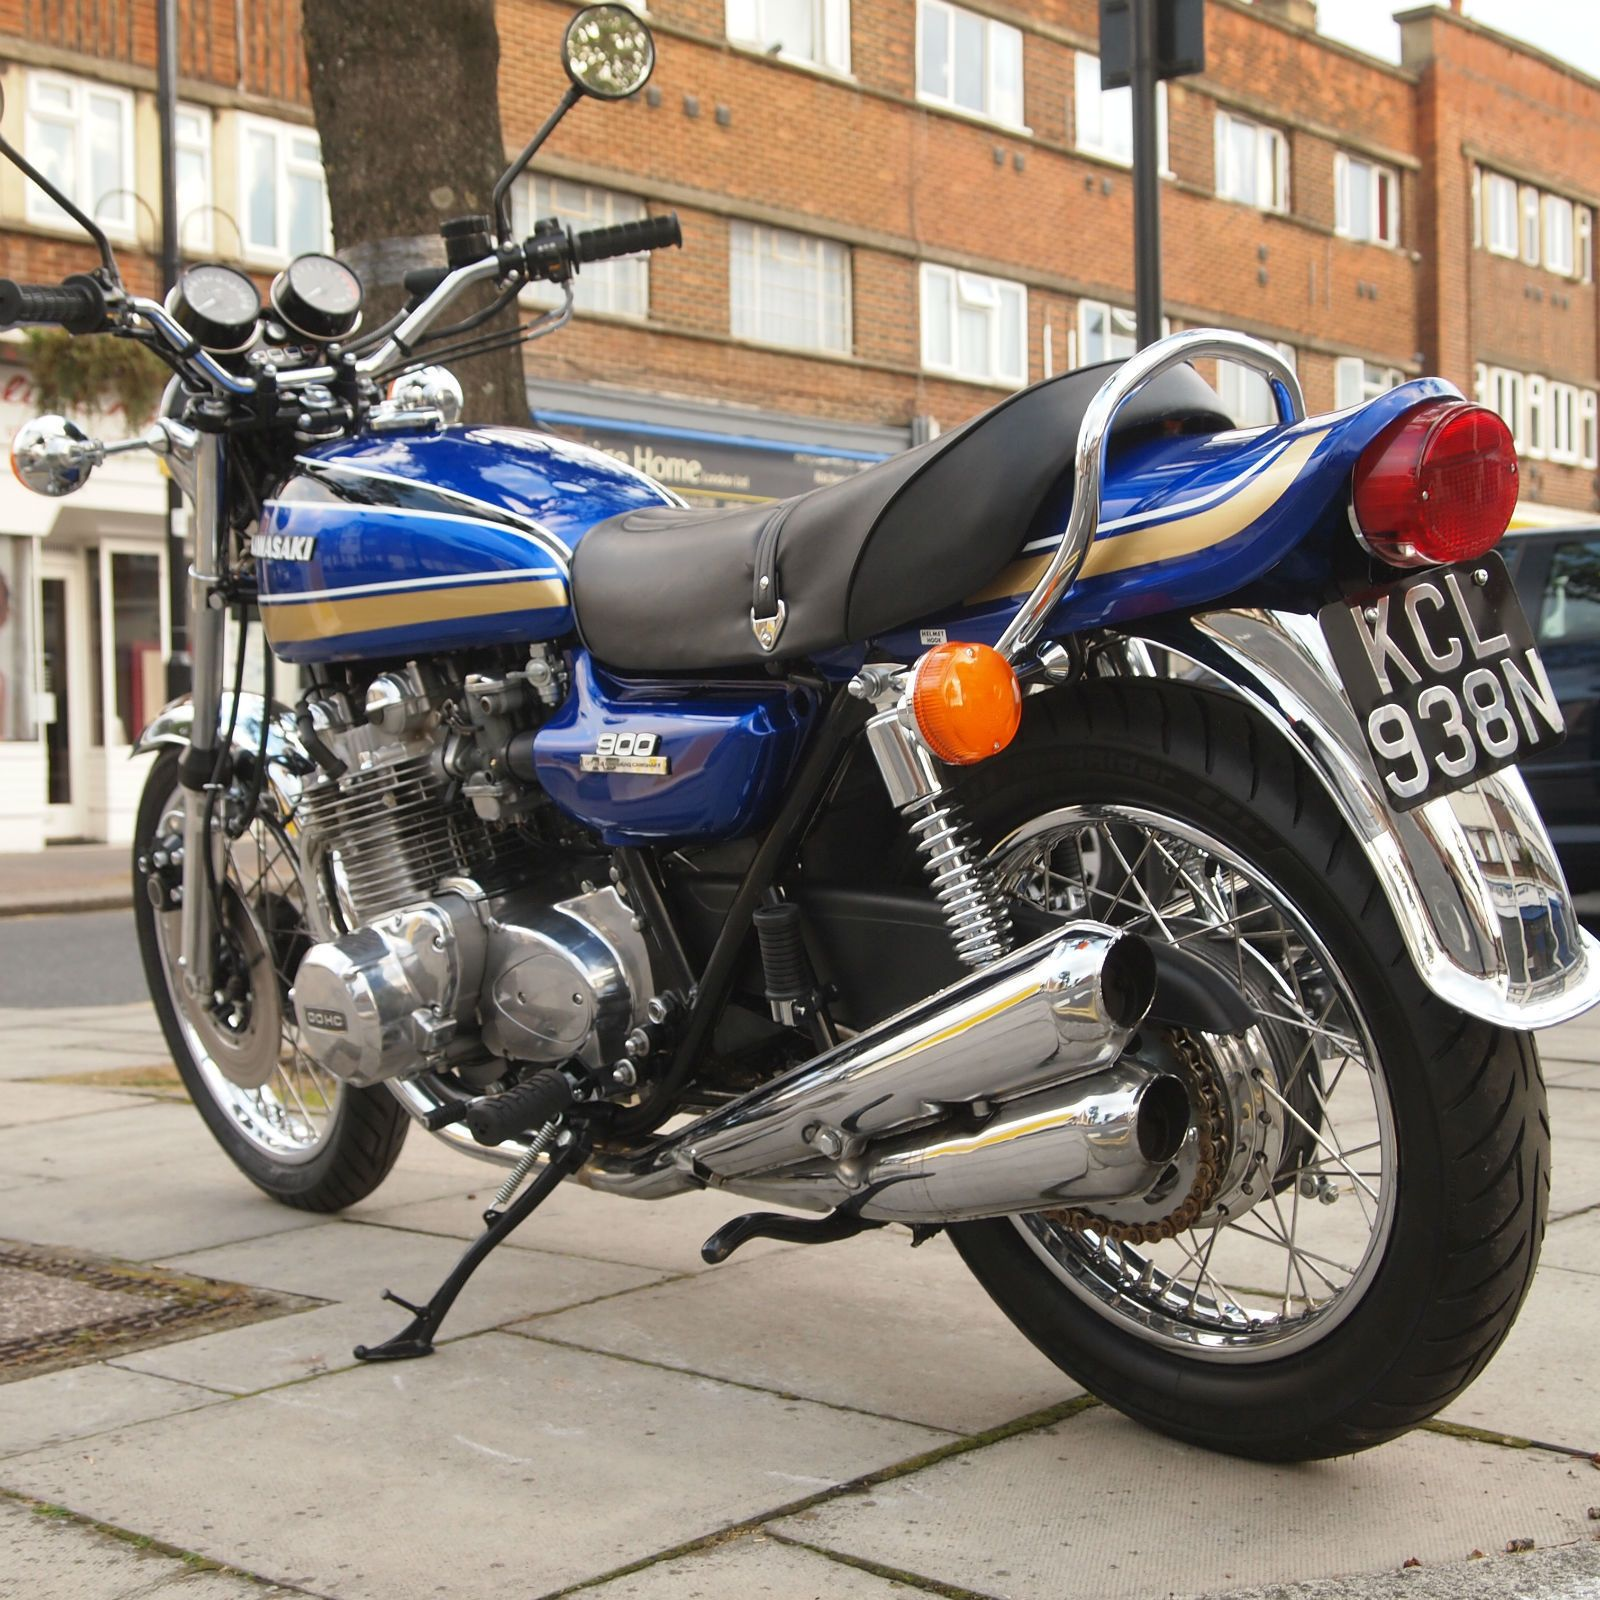 1975 Kawasaki Z1B 900 Clic Vintage, RESERVED FOR MARTIN ...